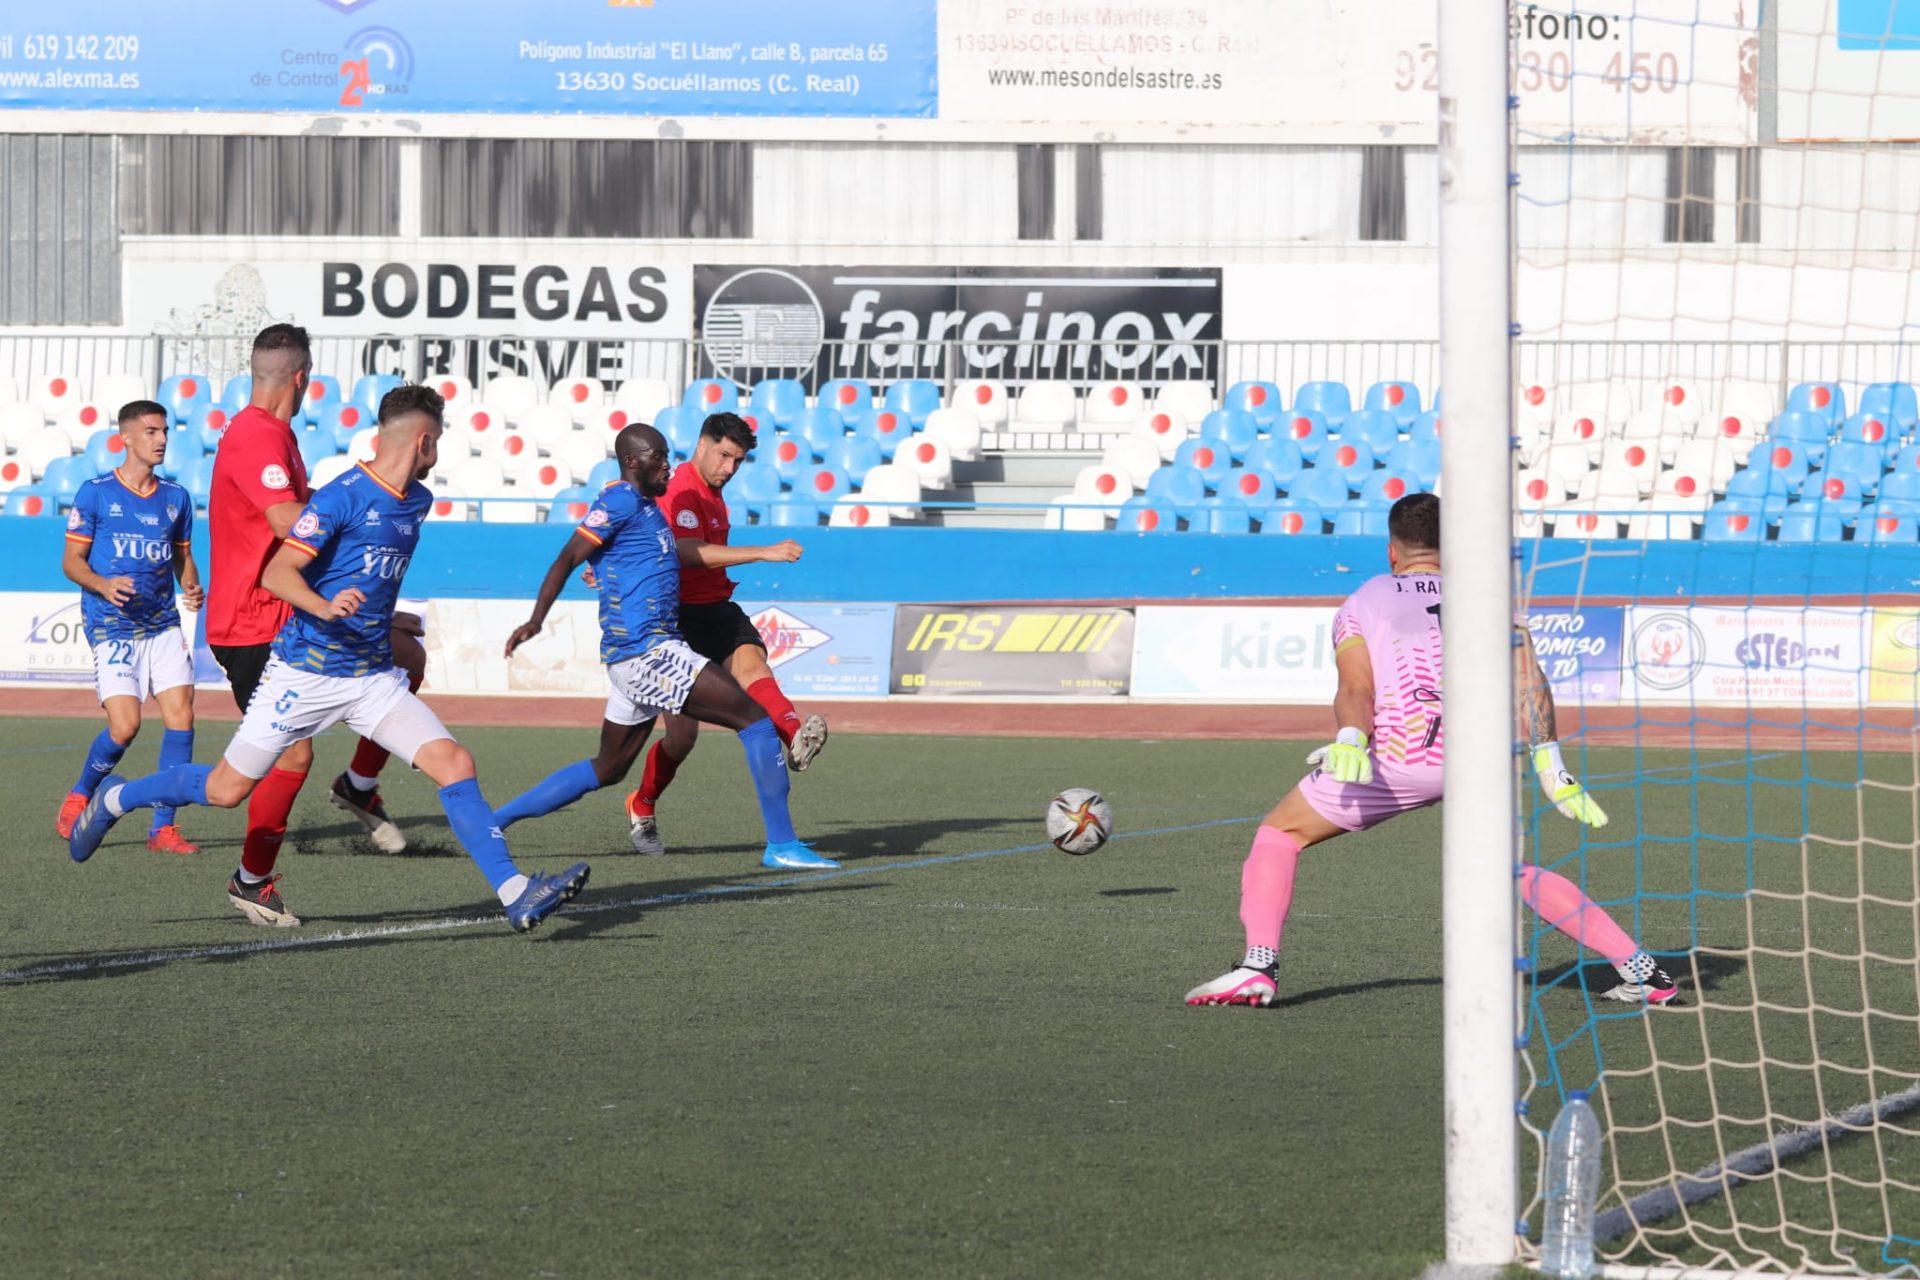 UD Socuéllamos vs CD El Ejido 2012 1